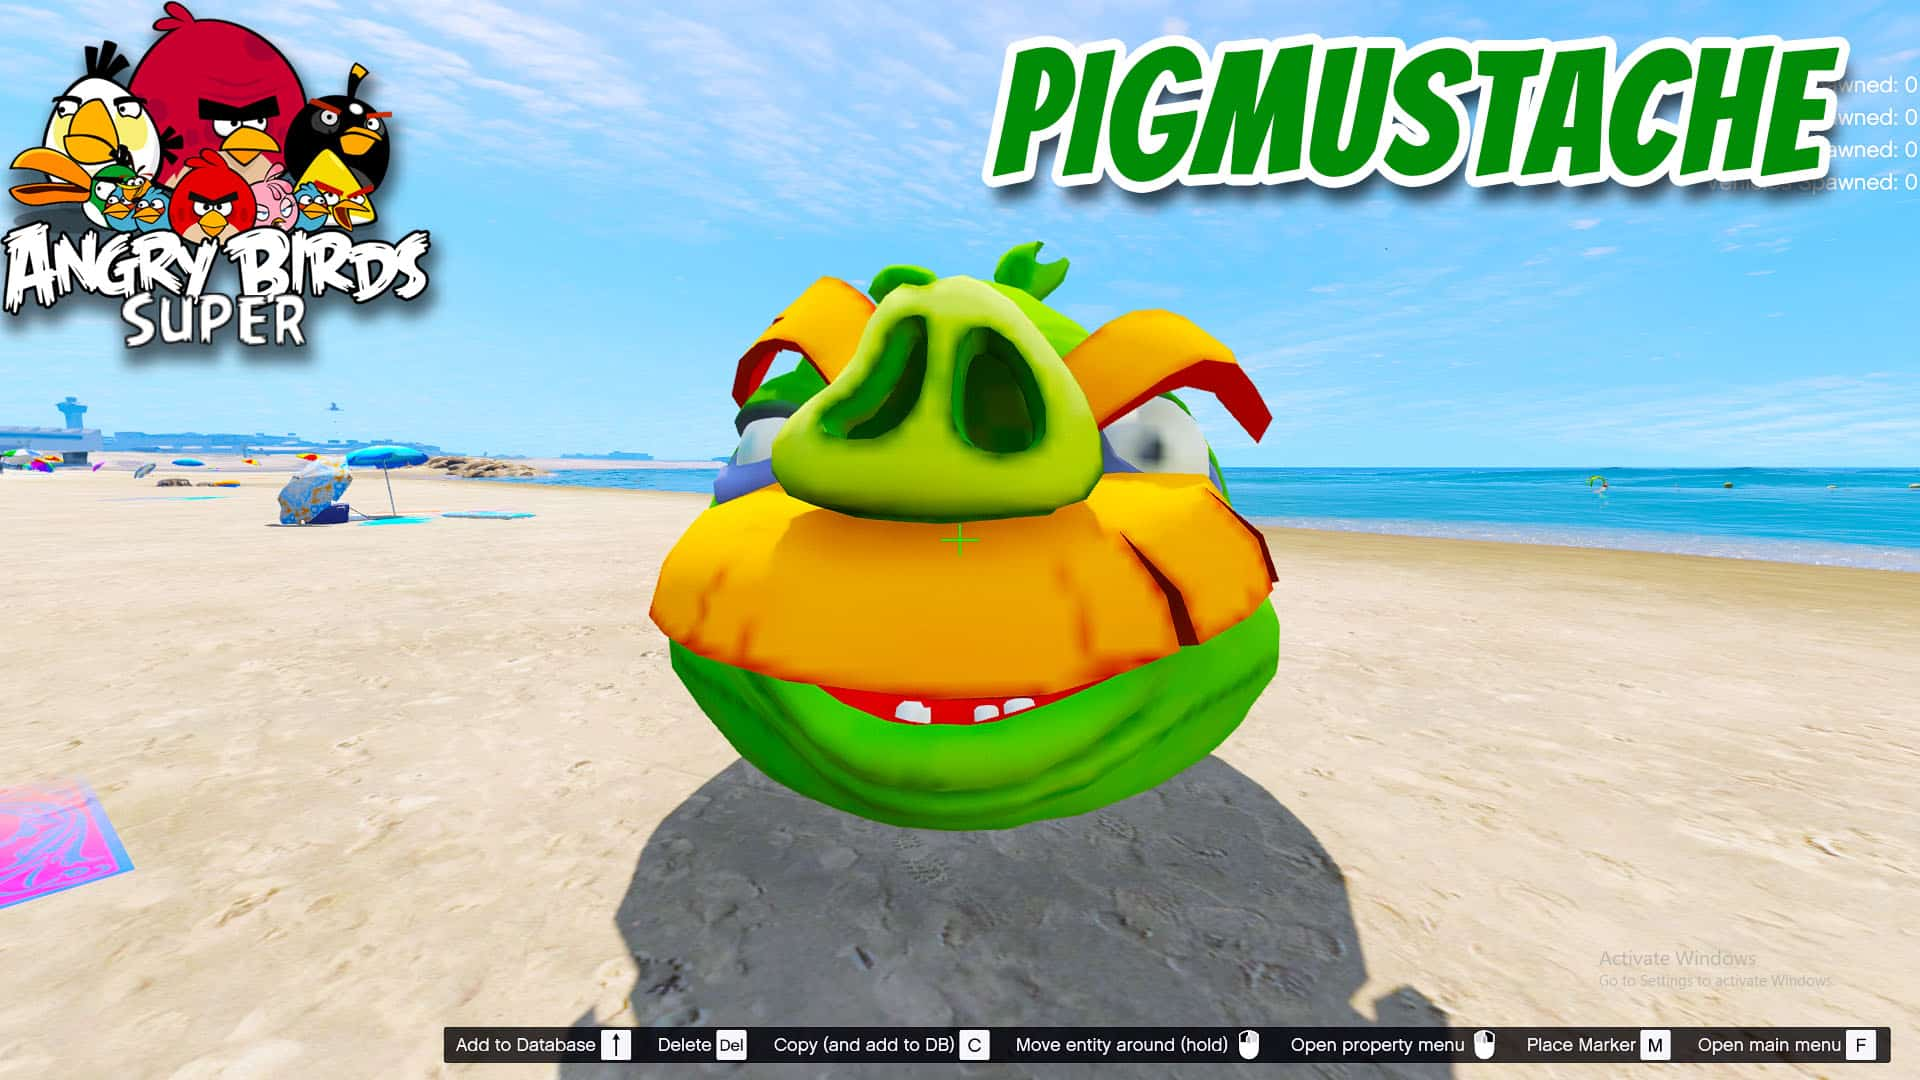 GTA5 Mod Angry Bird Pig Mustache